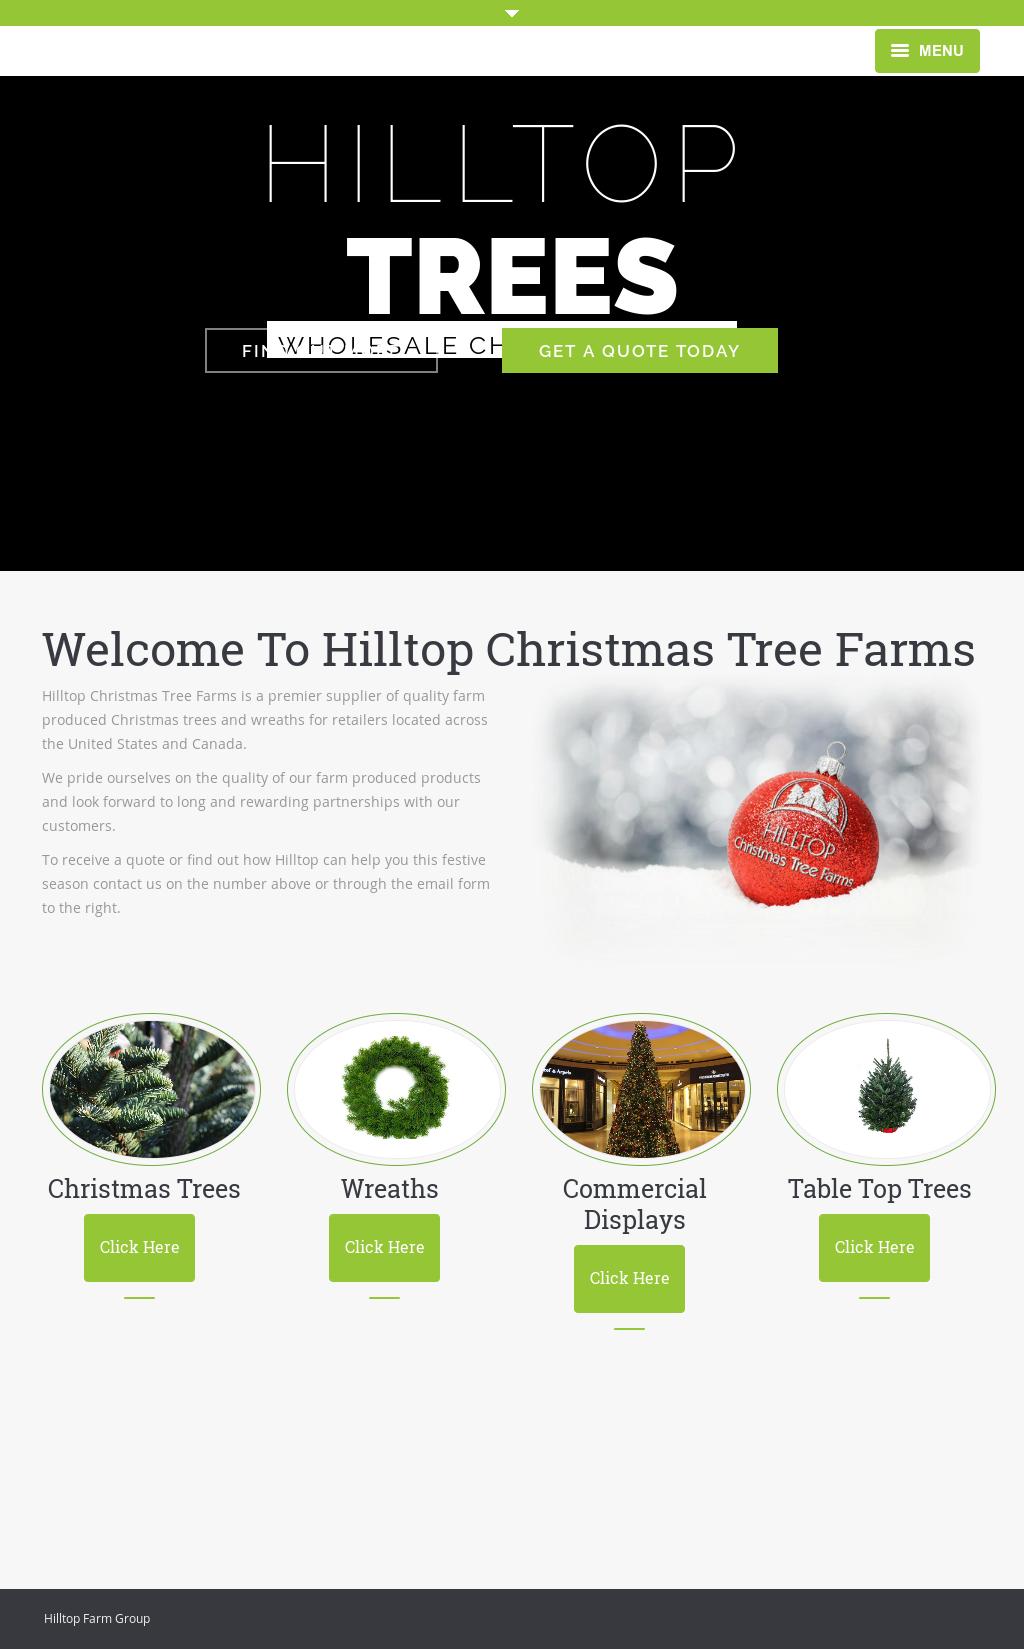 hilltop christmas tree website history - Hilltop Christmas